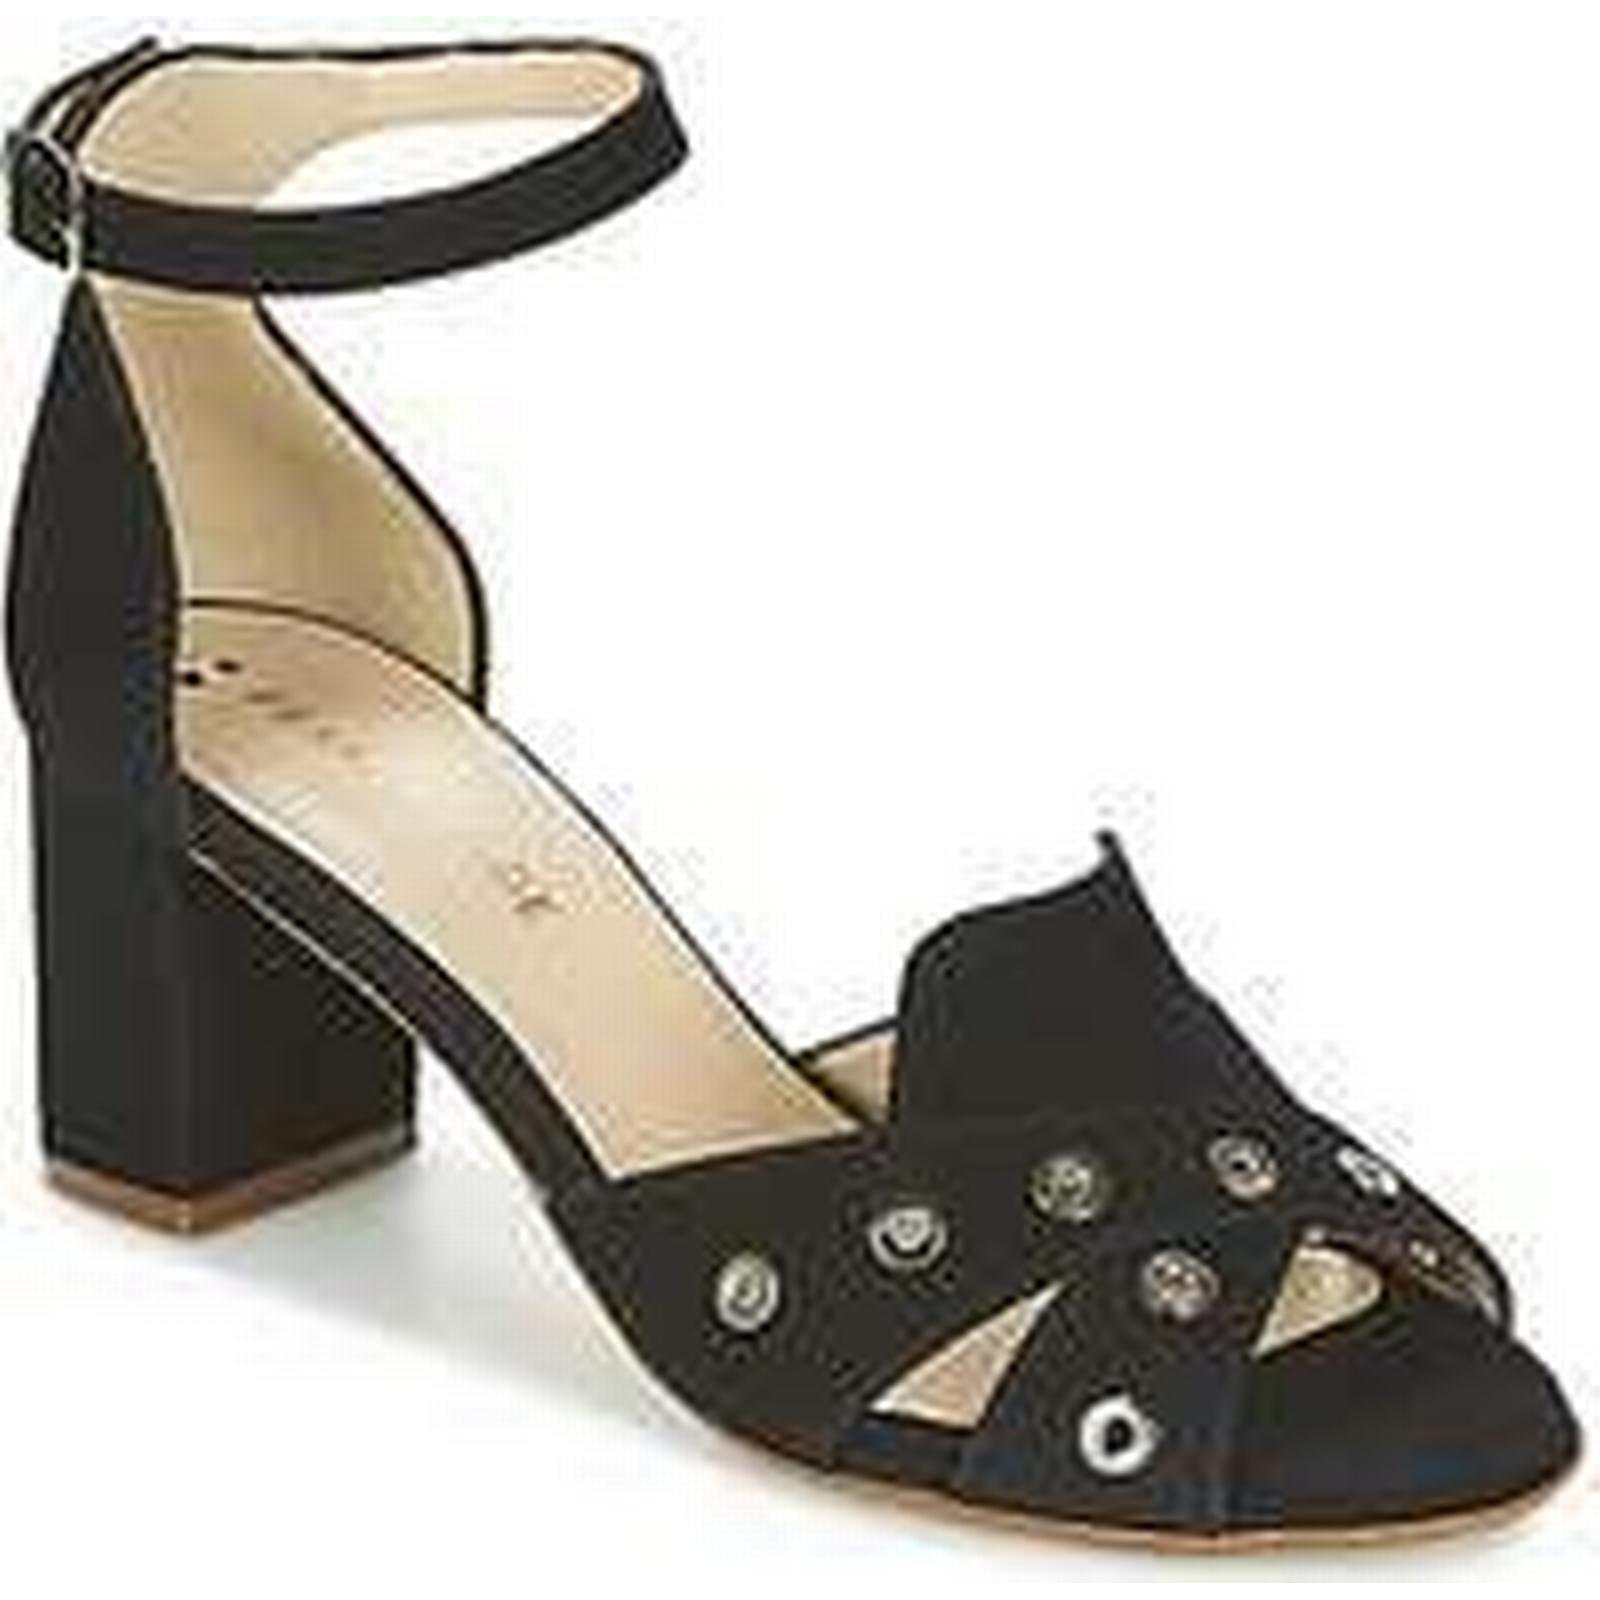 Spartoo.co.uk women's France Mode ODEON SETE women's Spartoo.co.uk Sandals in Black 360f23